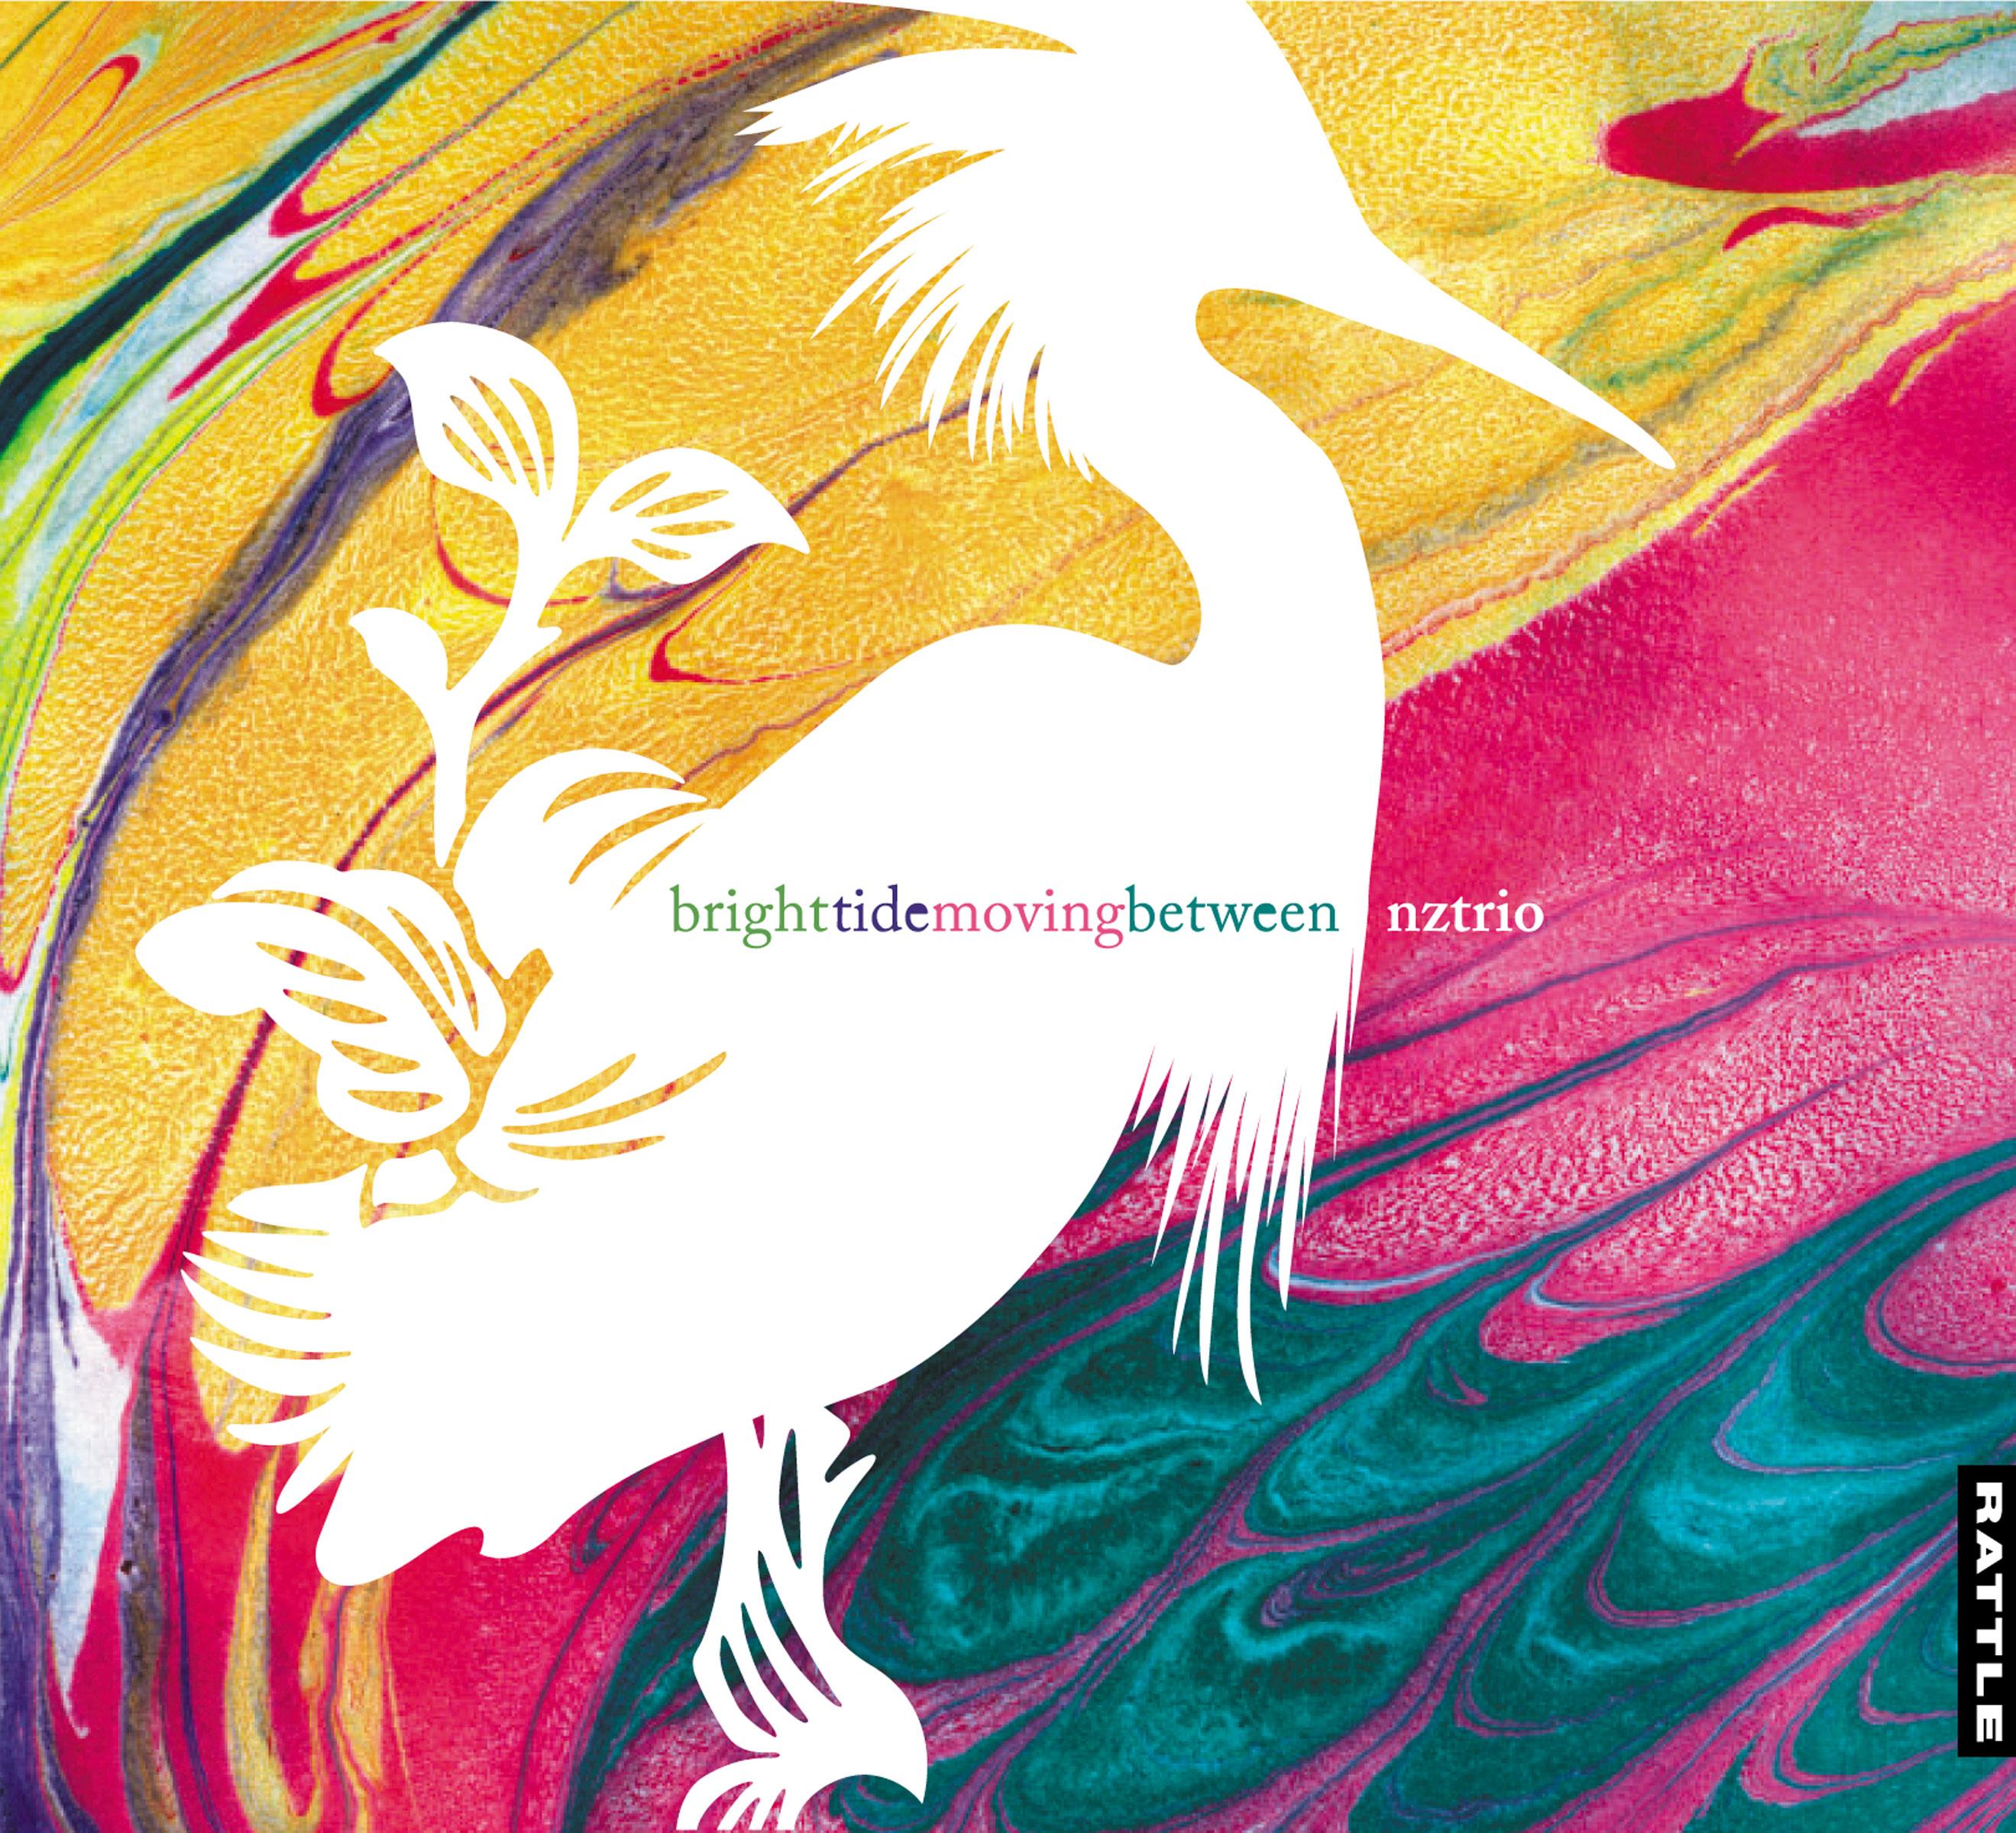 NZTrio | bright tide moving between - downloadable MP3 ALBUM